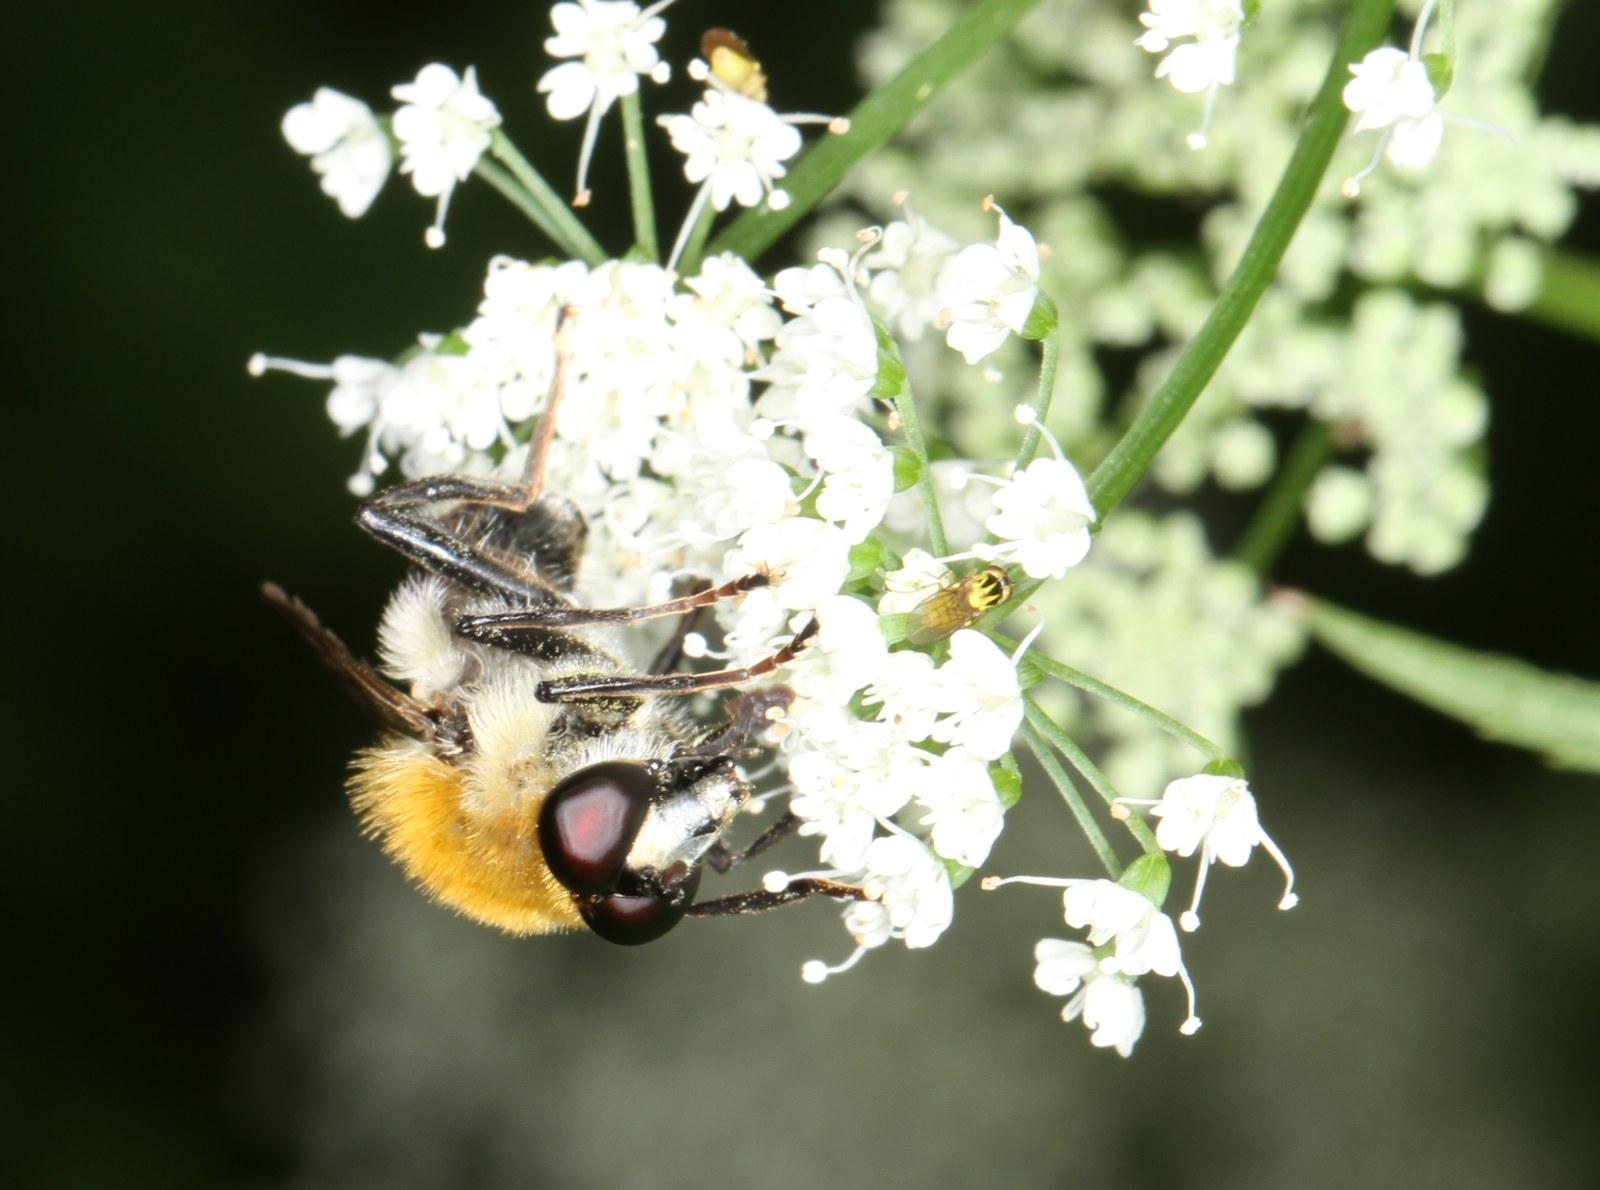 Uldhåret Pelssvirreflue (Criorhina floccosa)